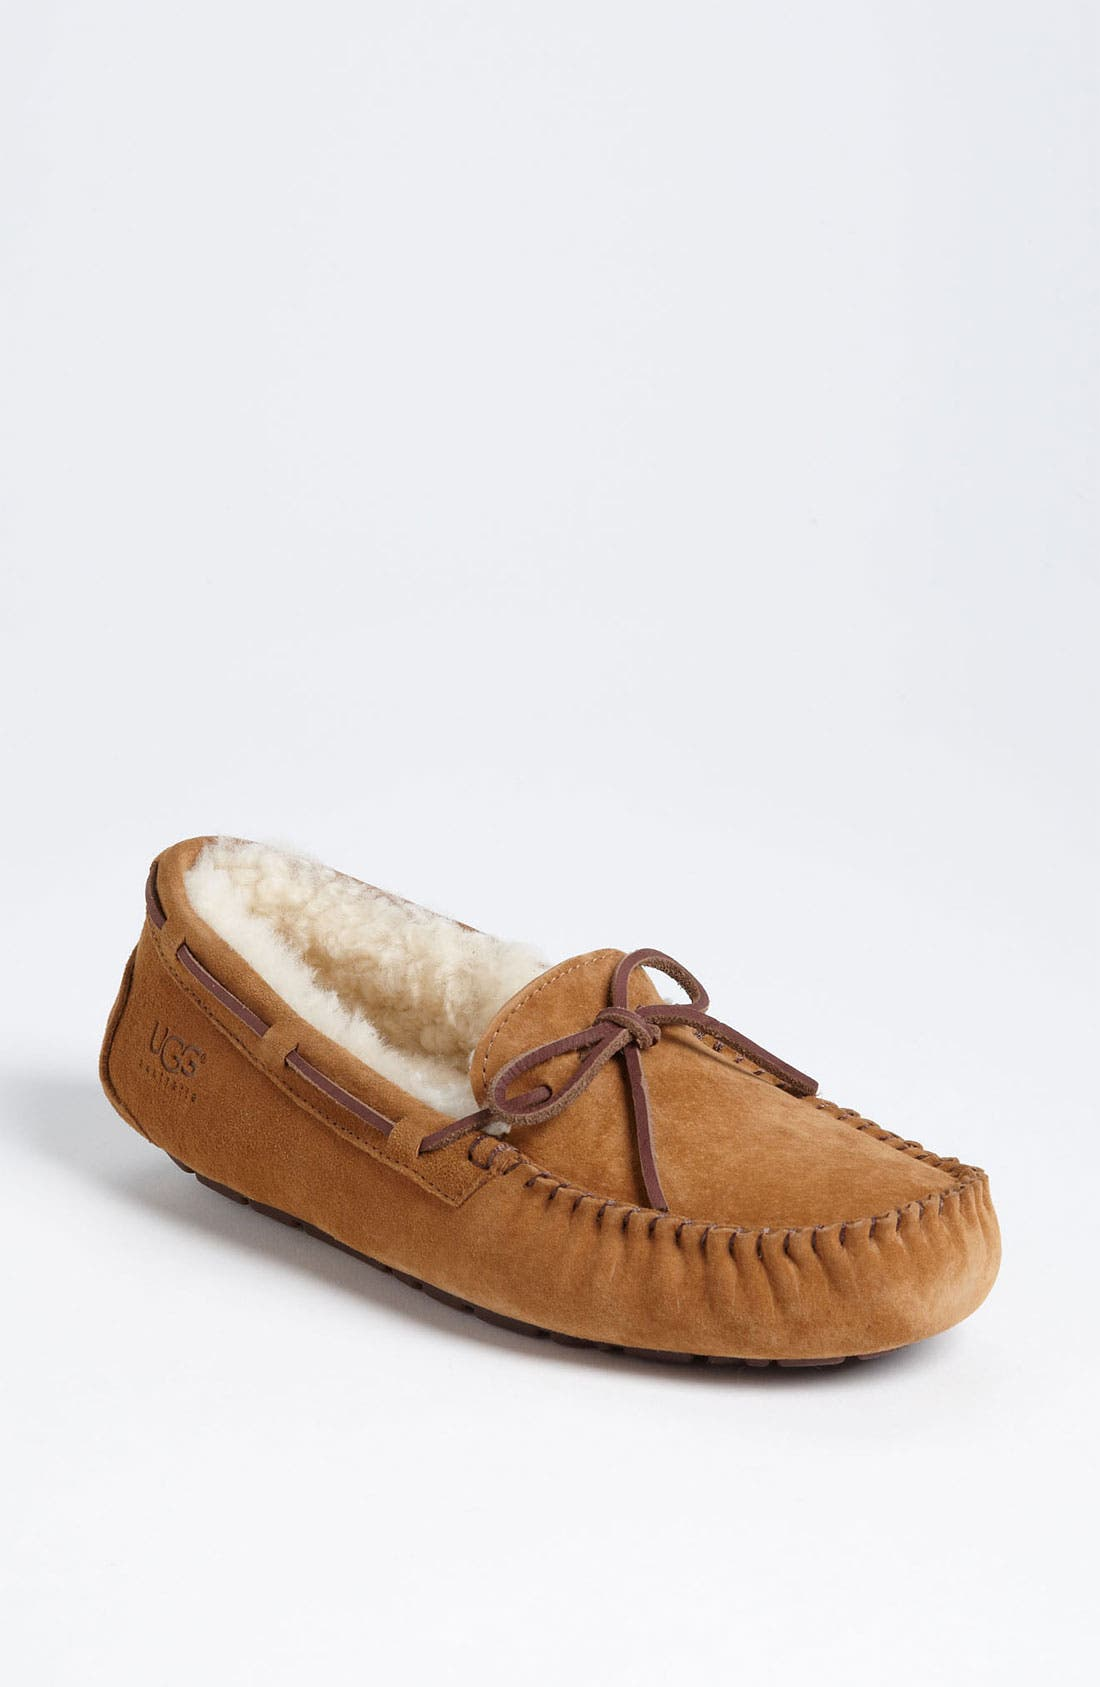 Ugg Dakota Water Resistant Slipper, Brown